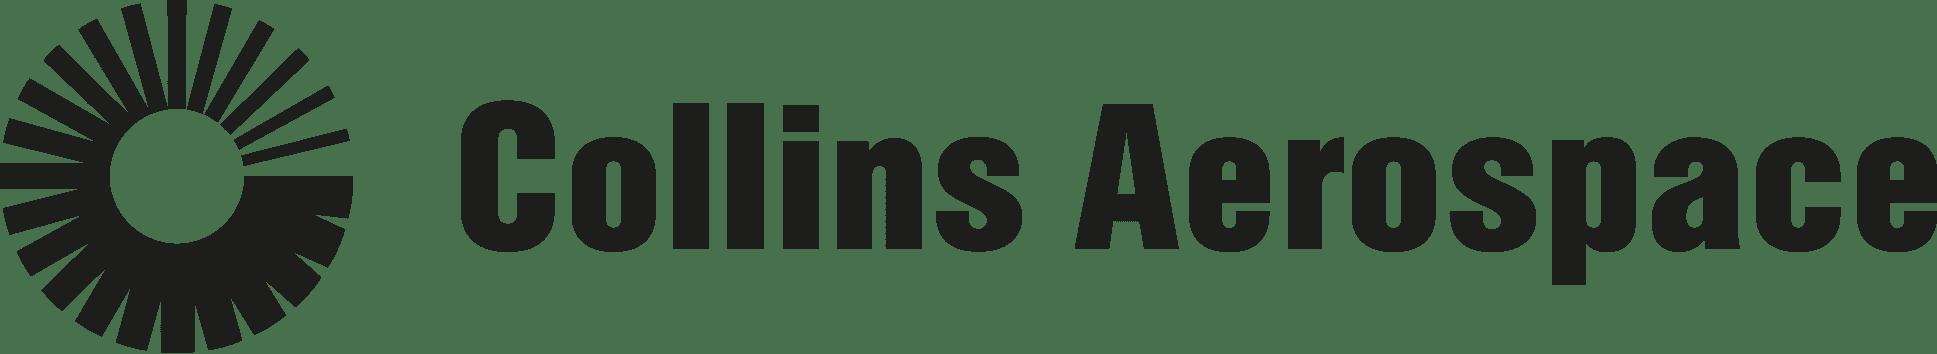 OEM-logo-Collins-Aerospace-page